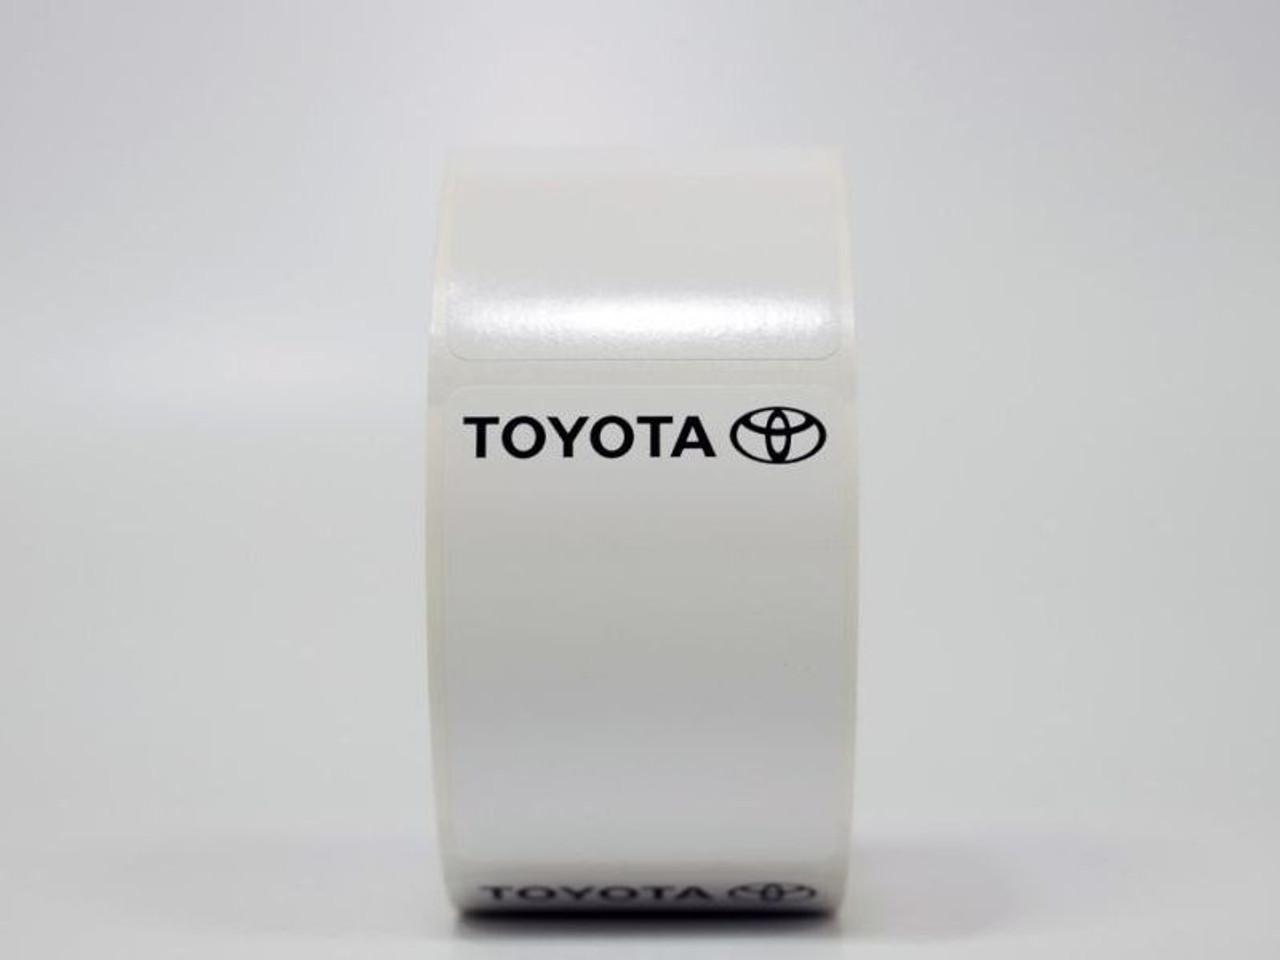 Toyota Lube Reminder Sticker - White Low-tac